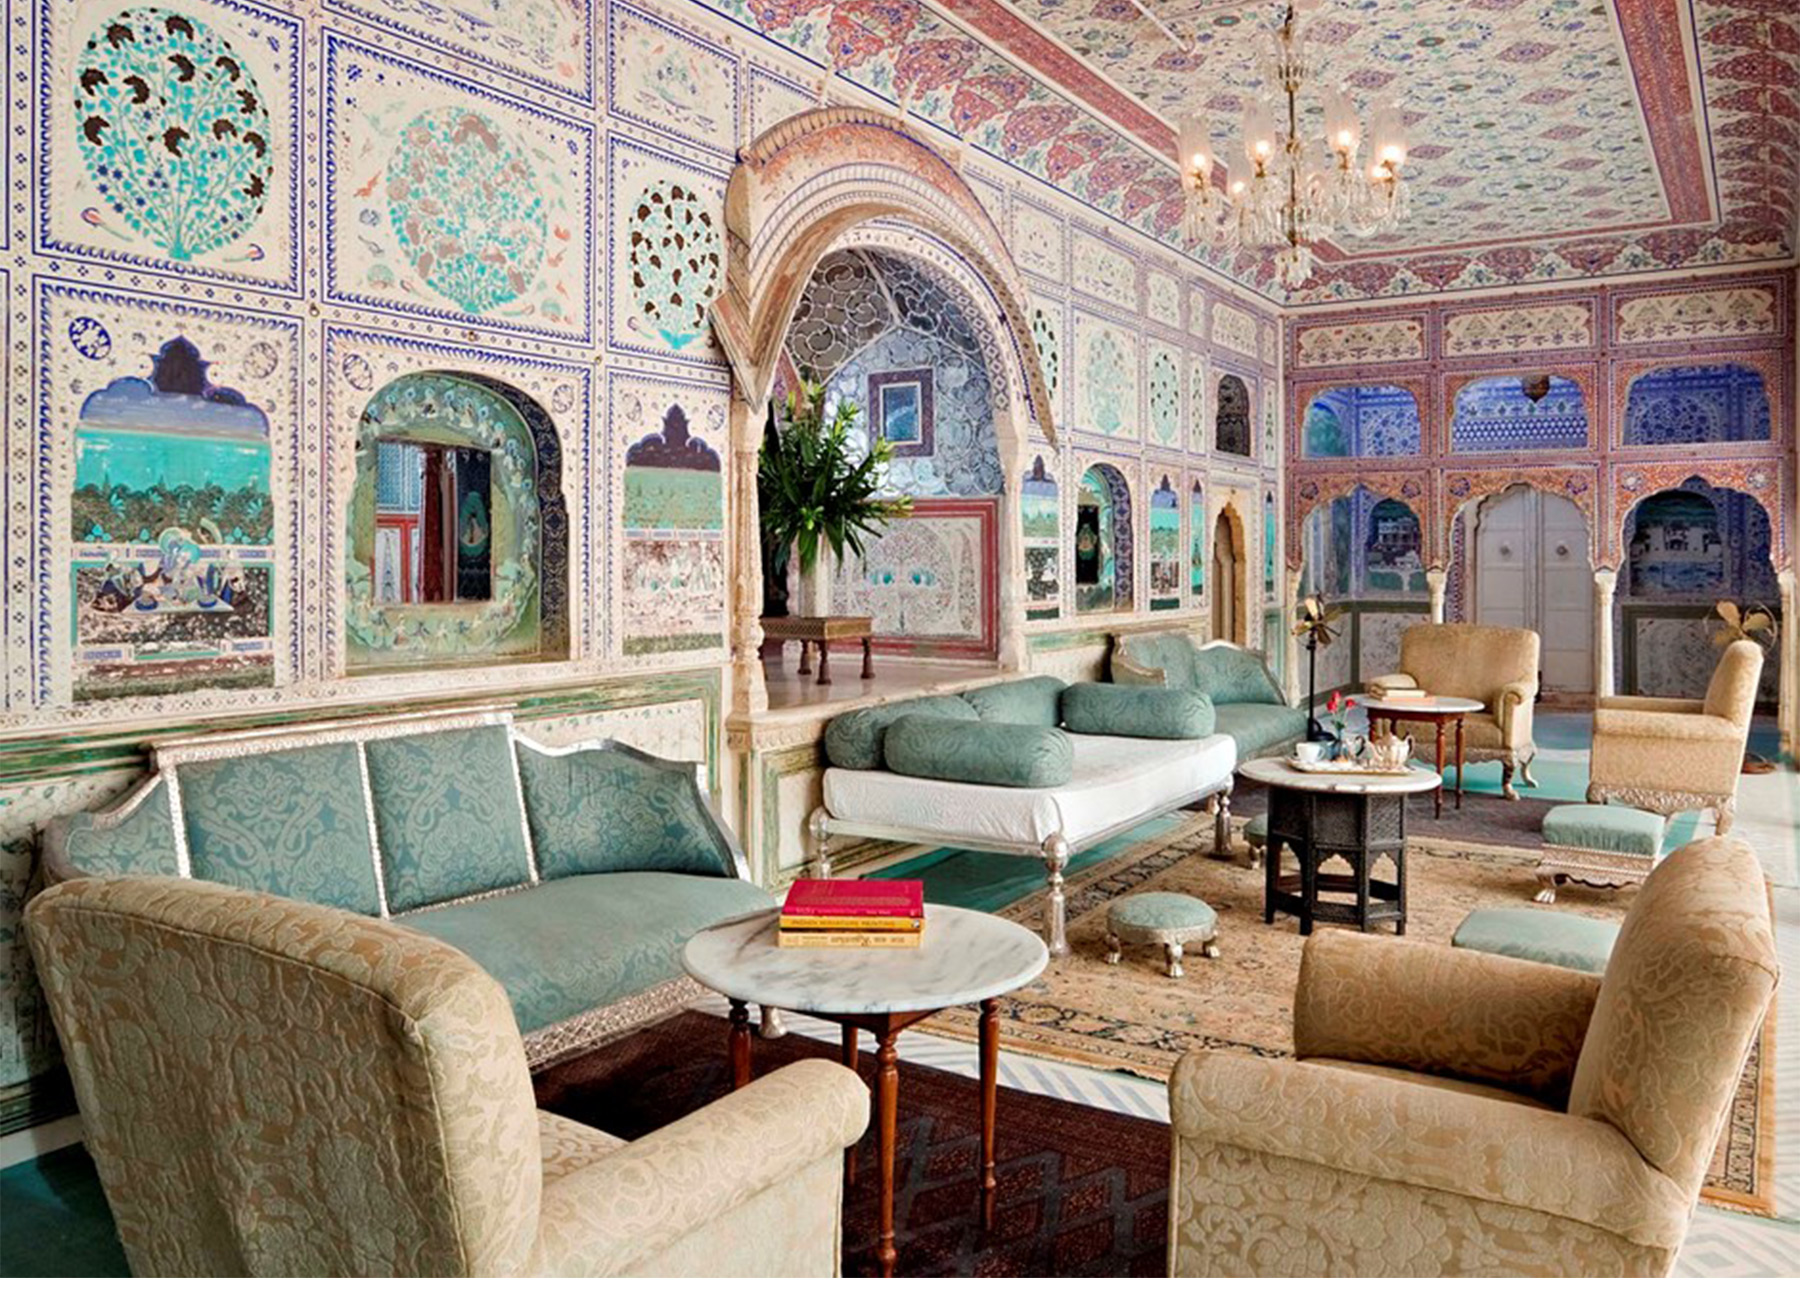 V246 great escapes samode palace jaipur rajasthan for Decor india jaipur